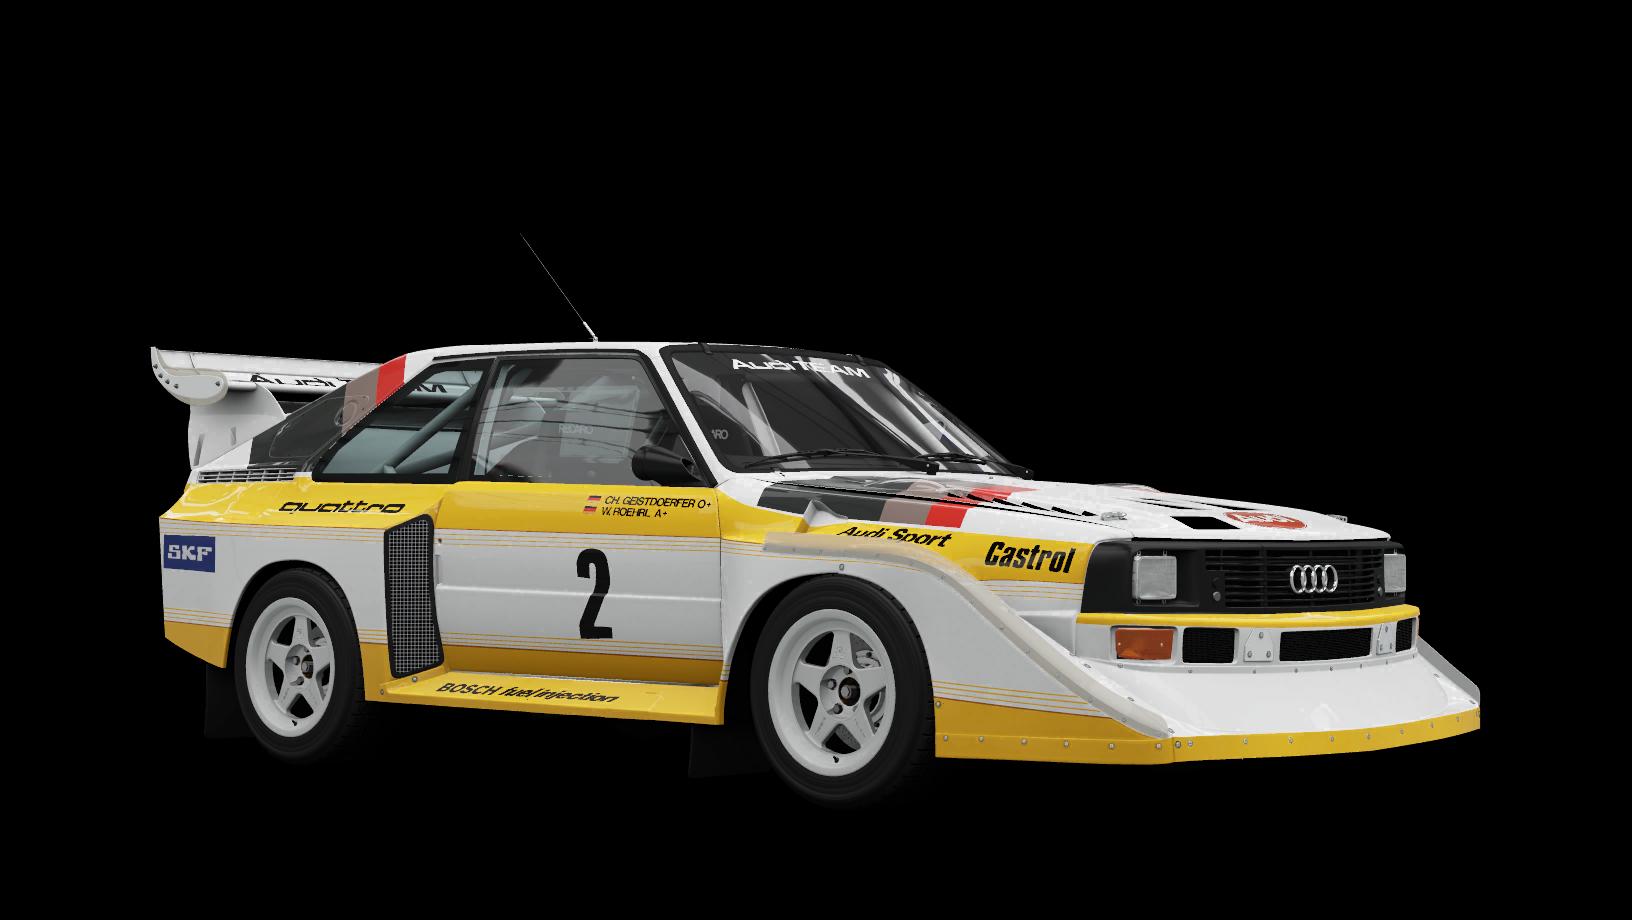 Kelebihan Kekurangan Audi Quattro S1 Murah Berkualitas